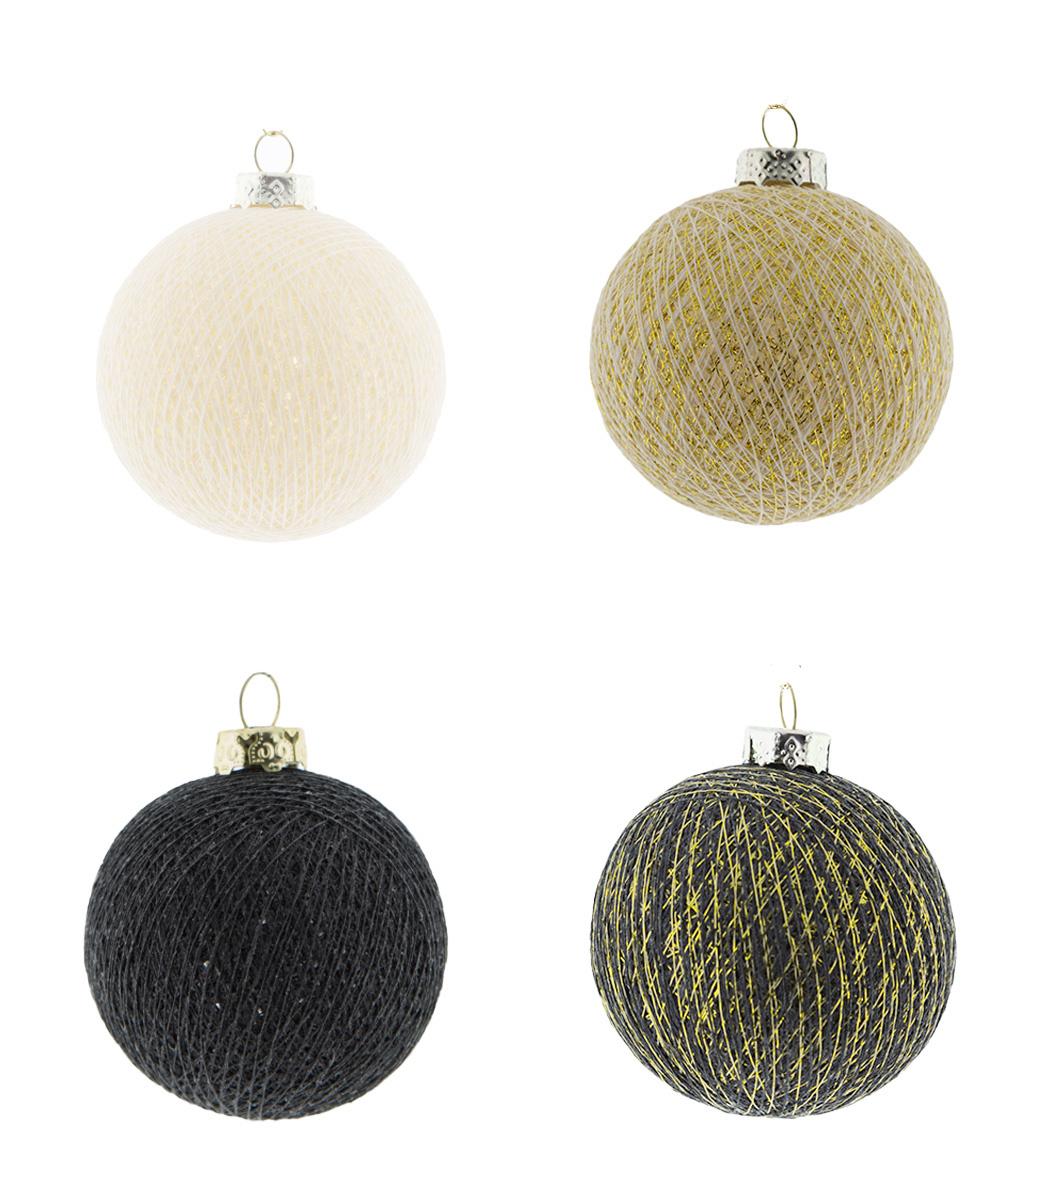 Kerstmis Cotton Balls - Midnight Chique